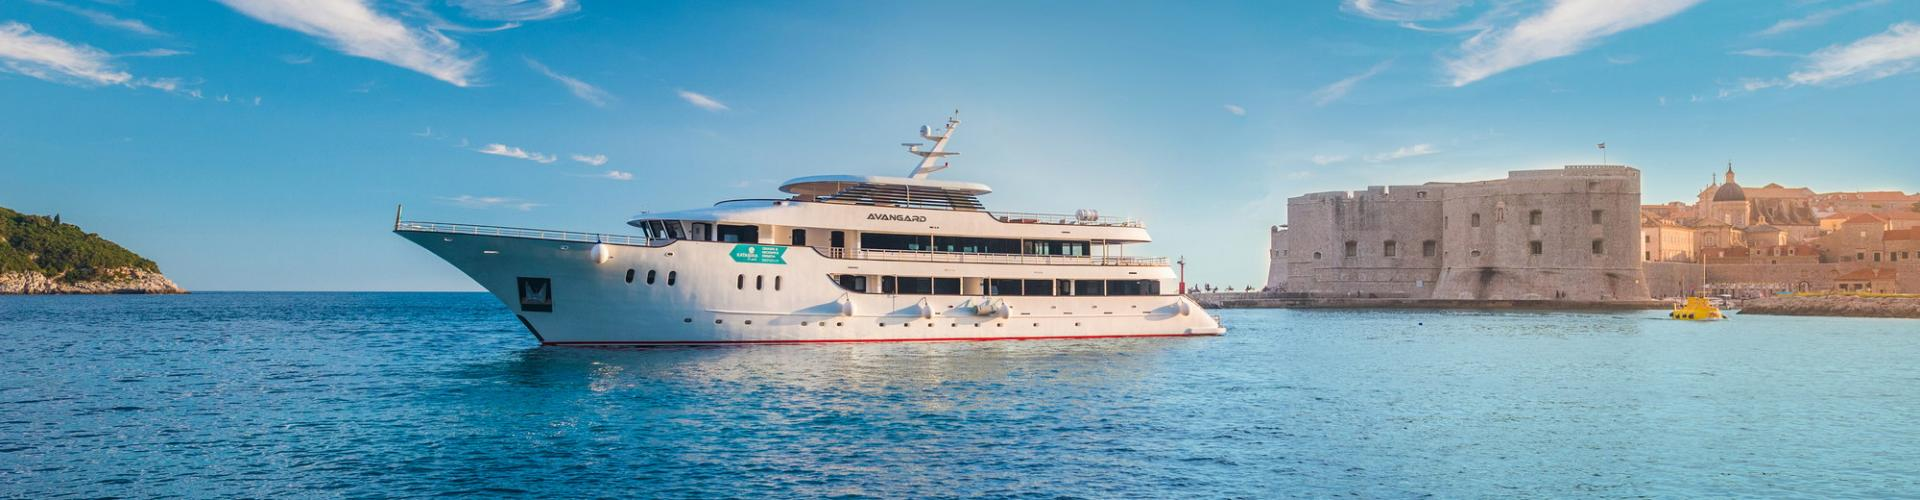 2017. Deluxe Superior cruiser MV Avangard